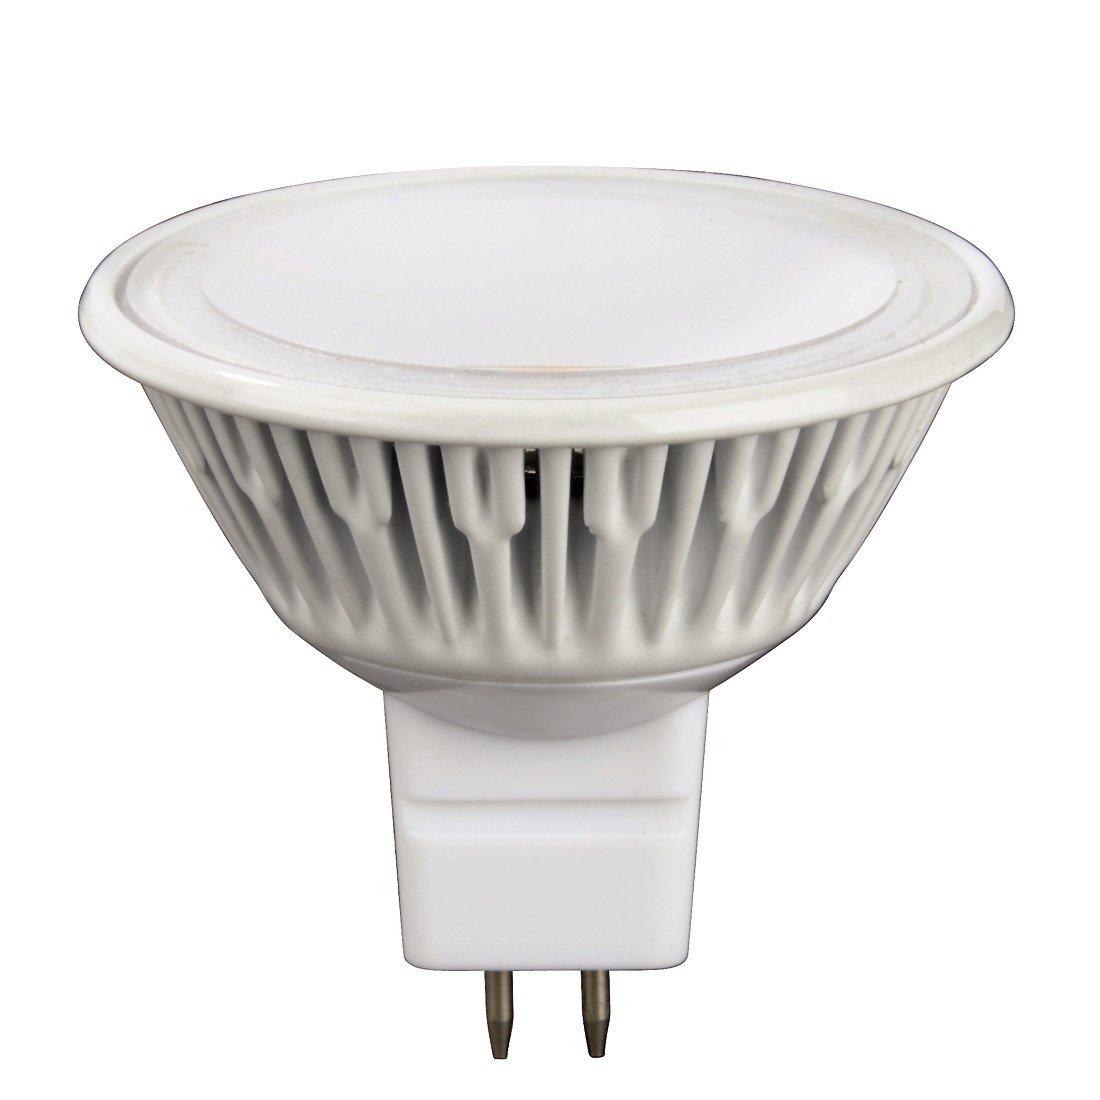 Xavax LED-Lampe GU5.3, 5.5W (ersetzt 30W), 275 lm, warmweiß: Amazon ...